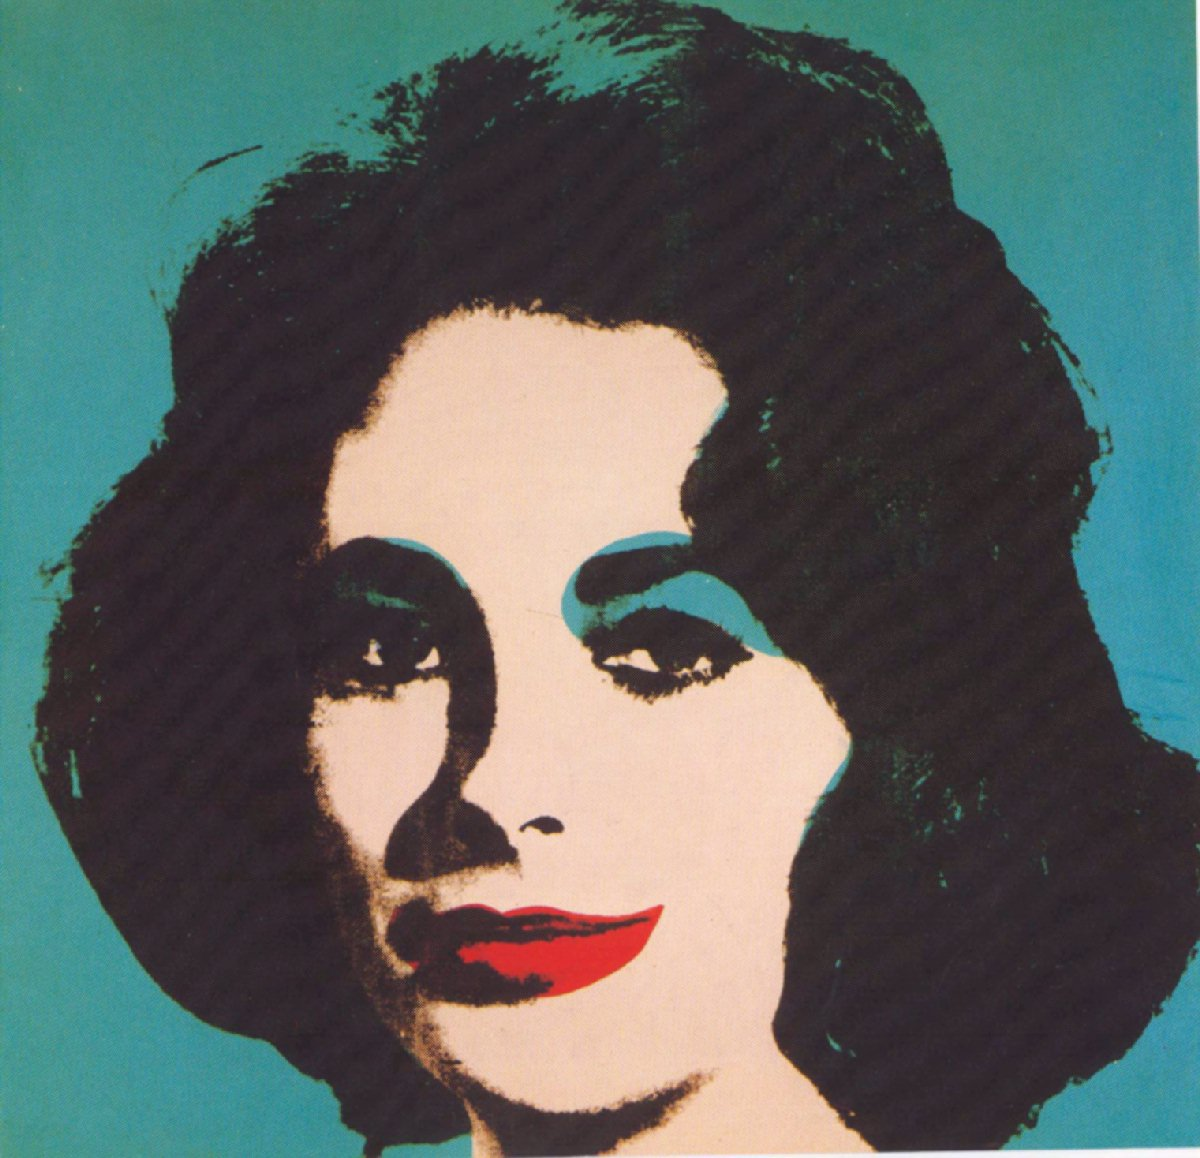 116 of Warhol s original